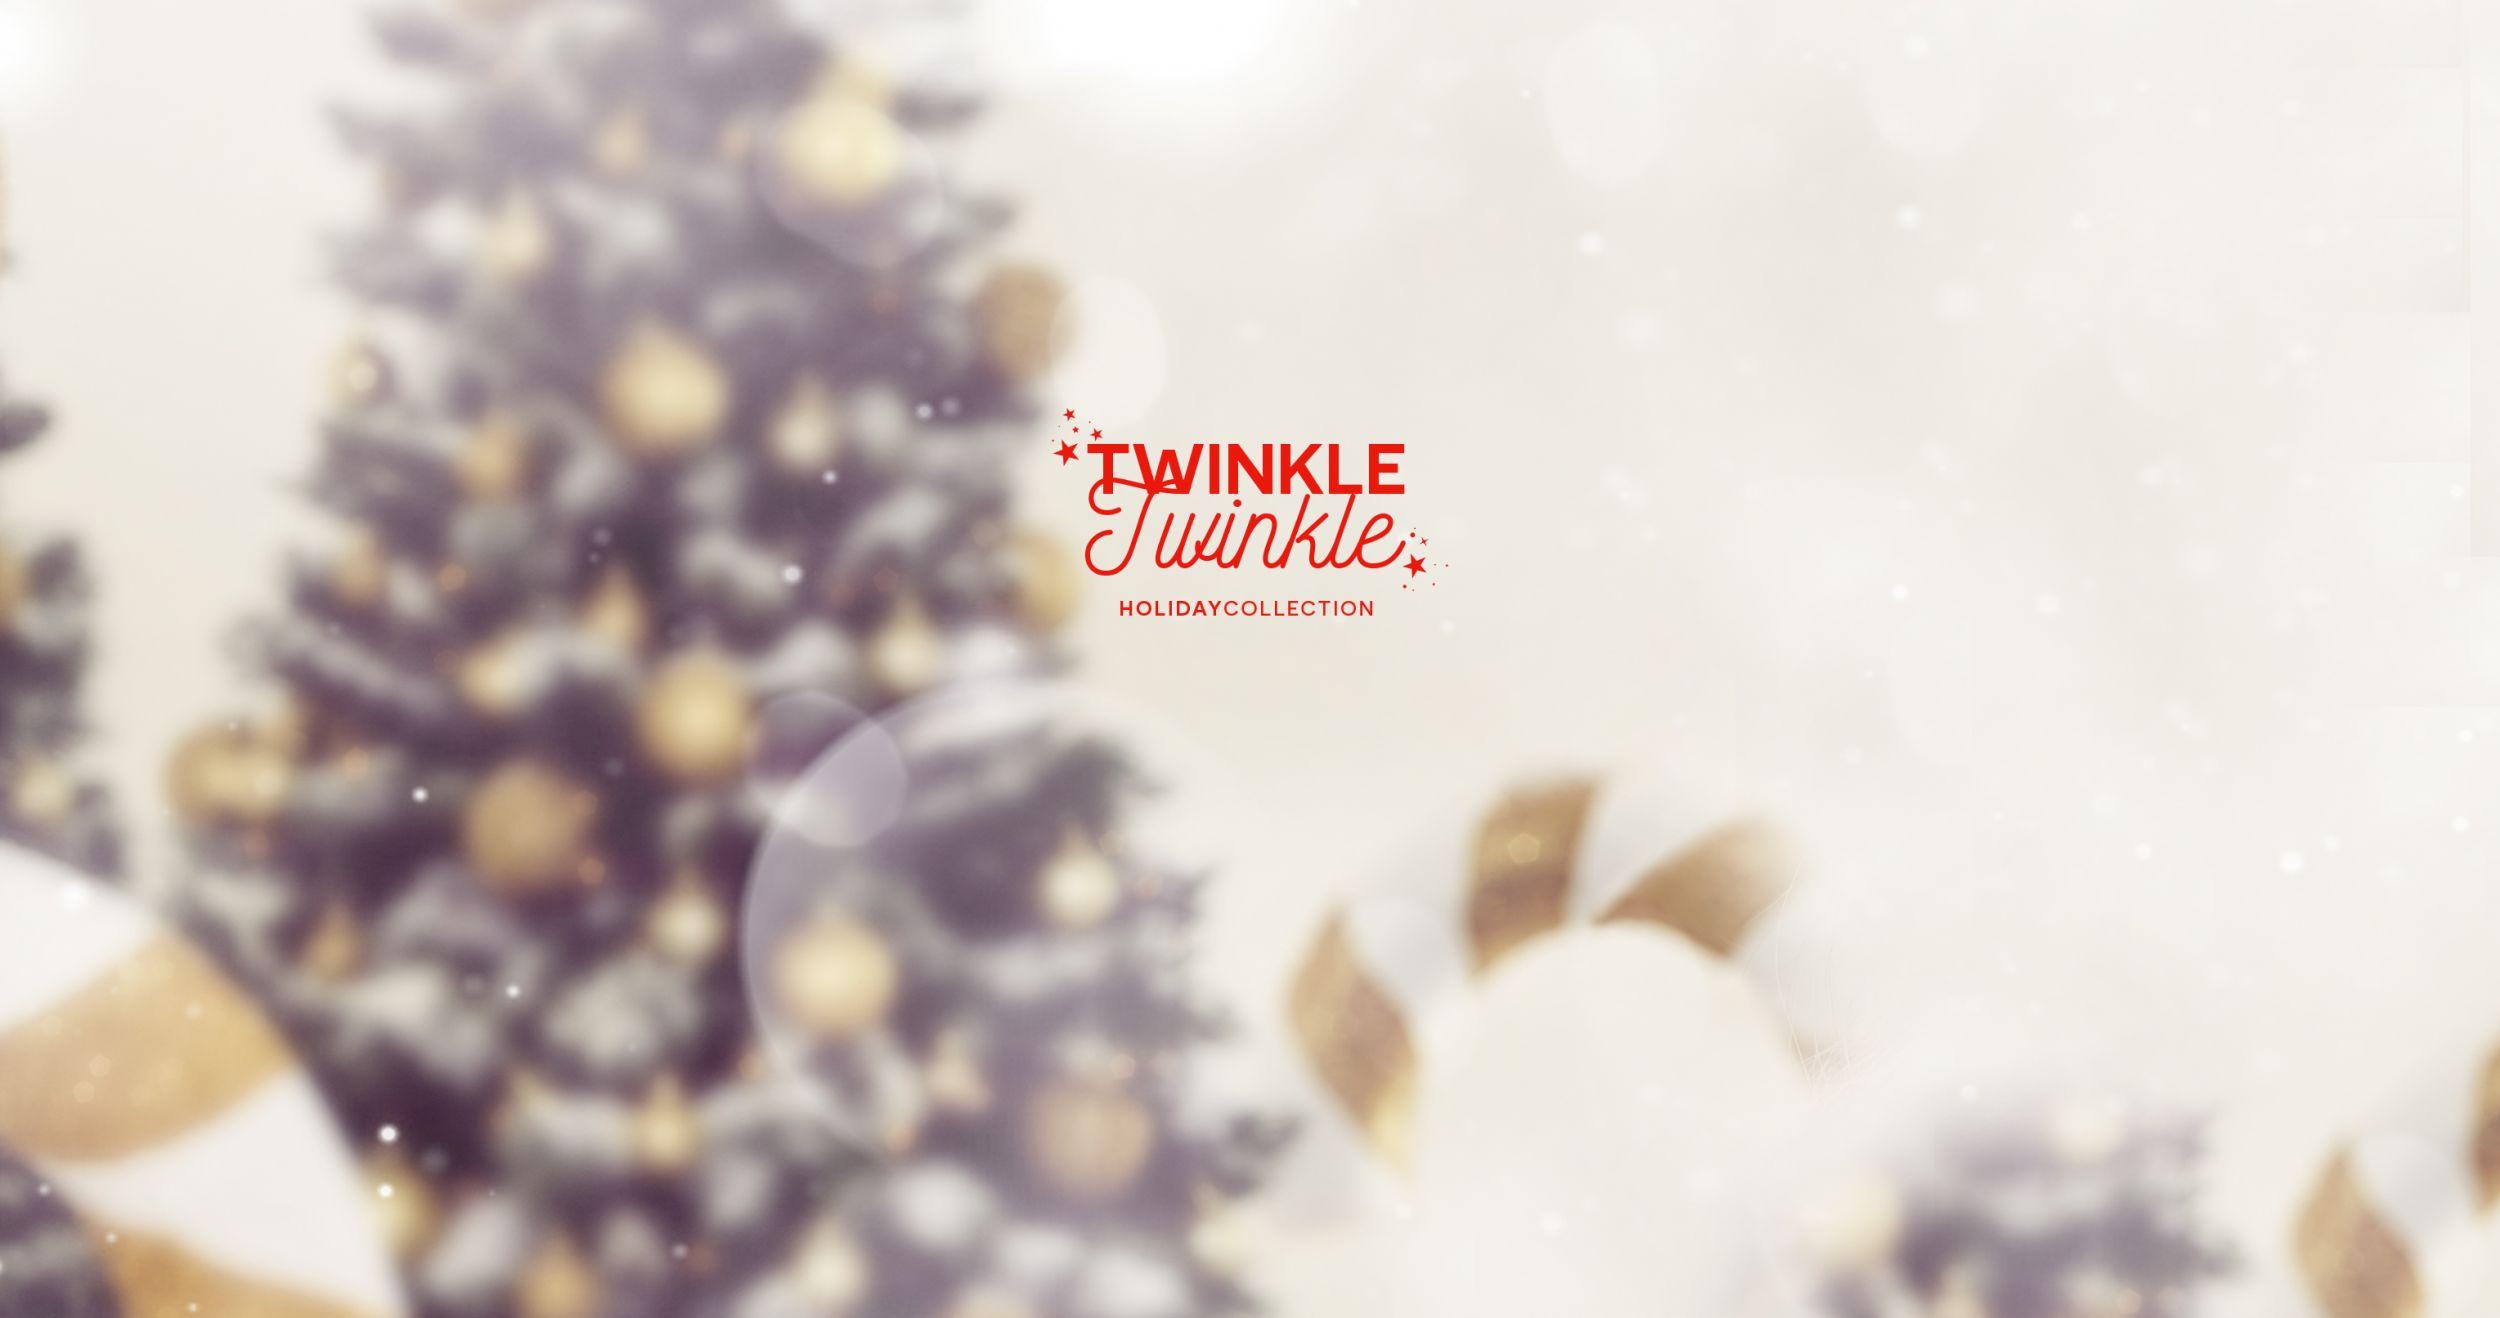 TWINKLE TWINKLE video campagna